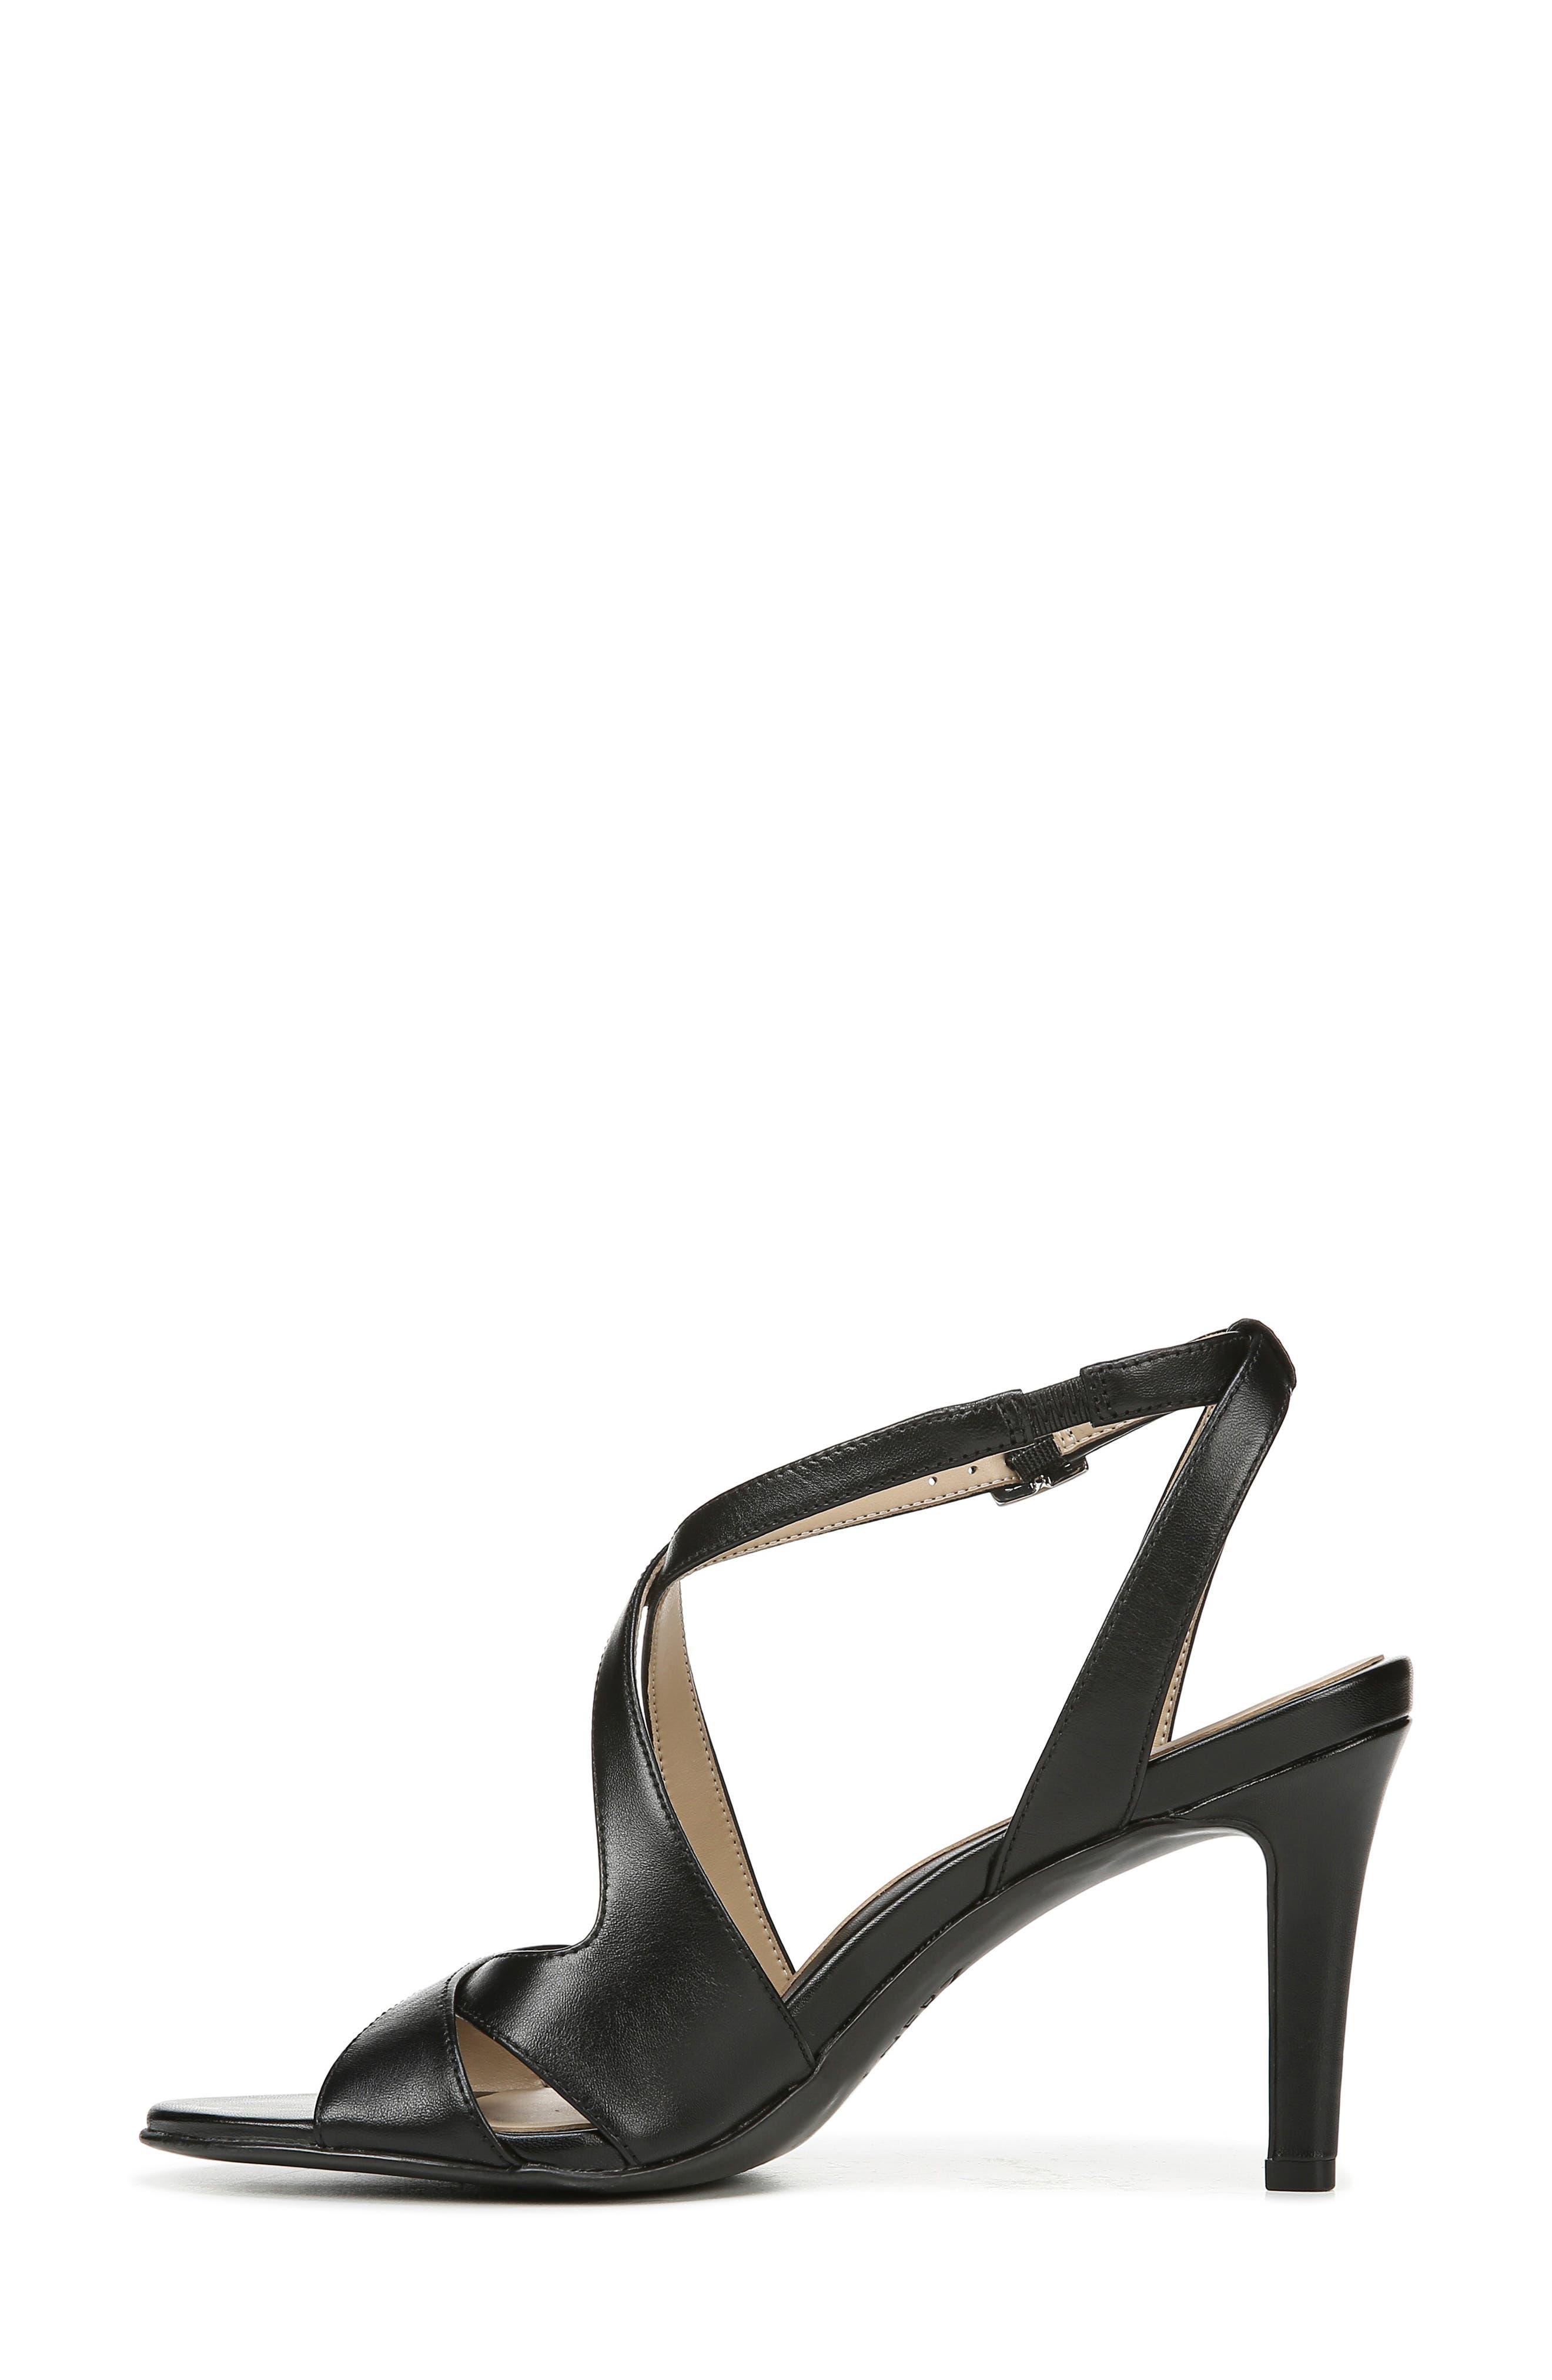 NATURALIZER, Klein Strappy Sandal, Alternate thumbnail 9, color, BLACK LEATHER